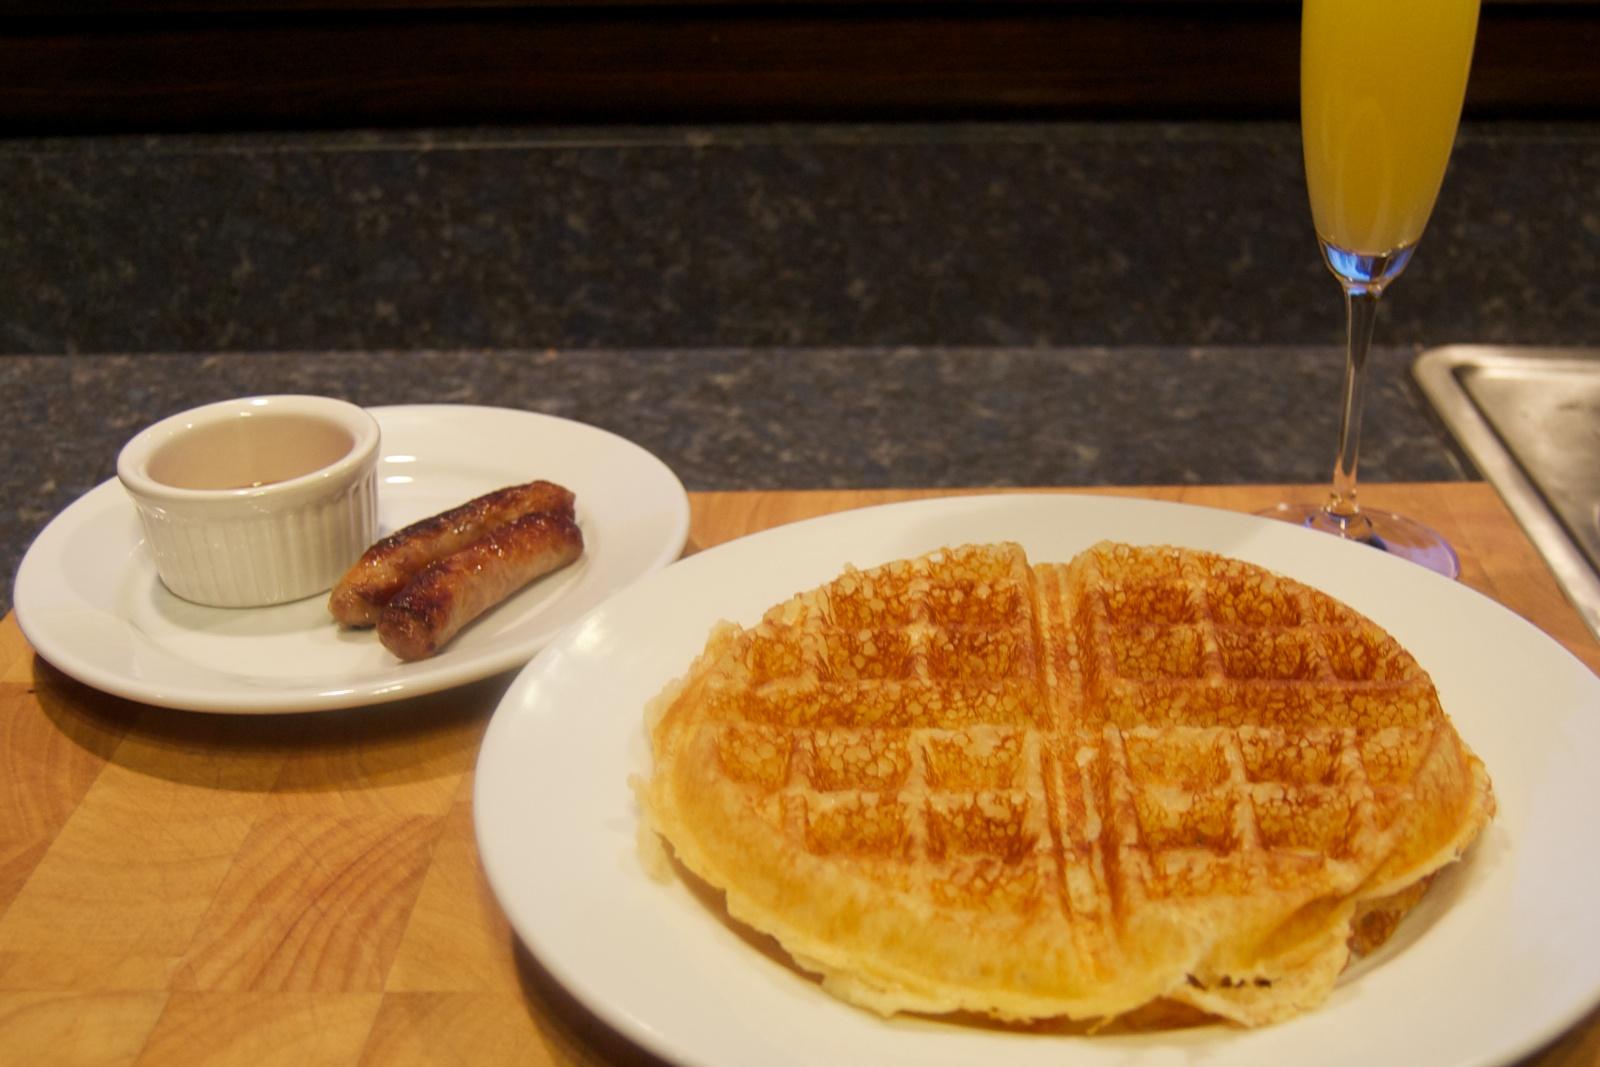 http://blog.rickk.com/food/2011/10/29/ate.2011.10.29.b.jpg